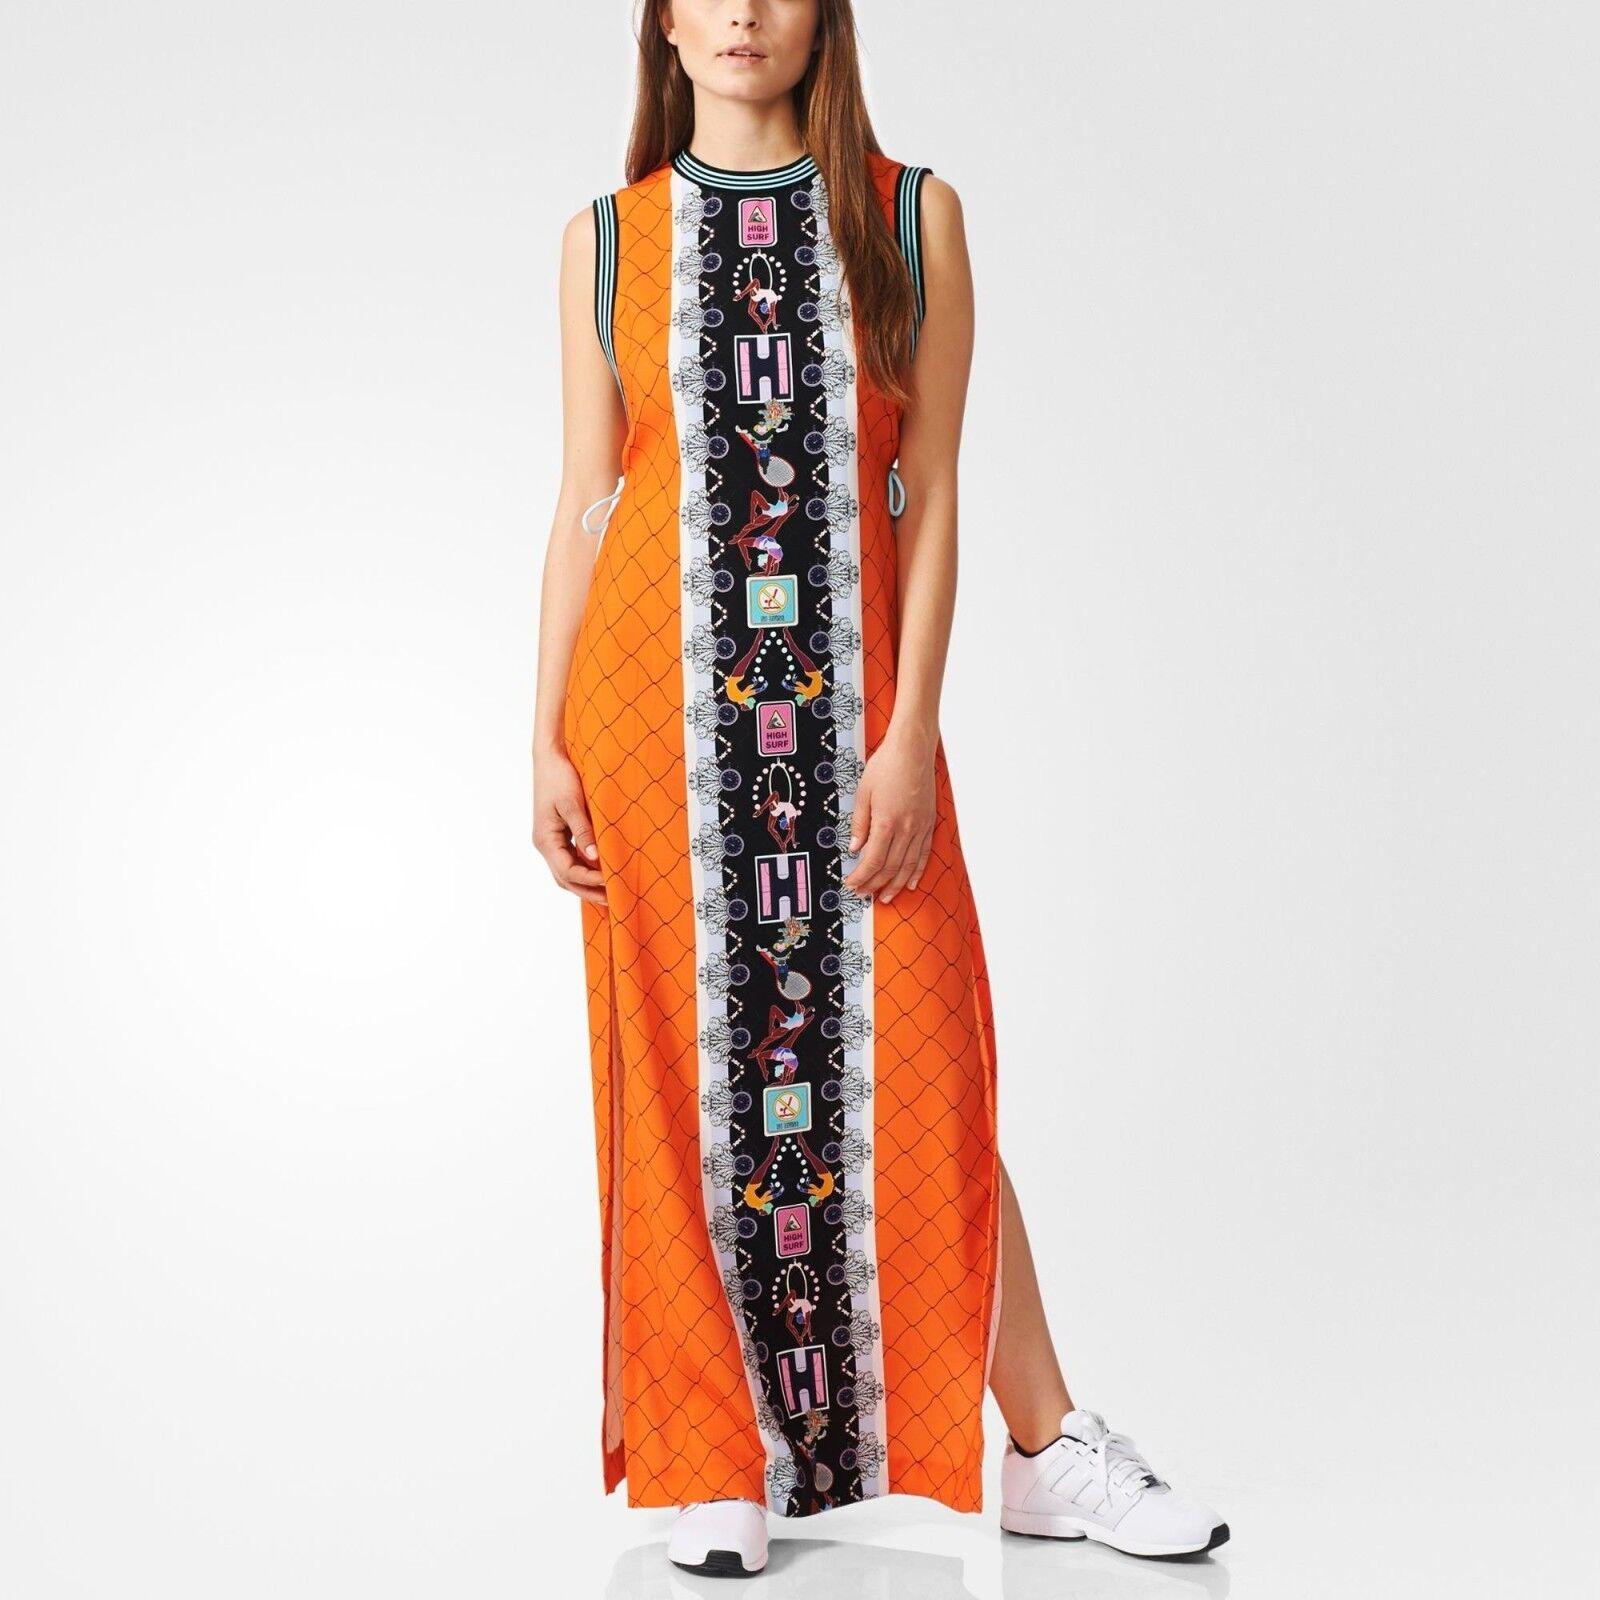 Donna Adidas Originals da Mary Katrantzou Katrantzou Katrantzou Floor-Maxi Dress eae8c8